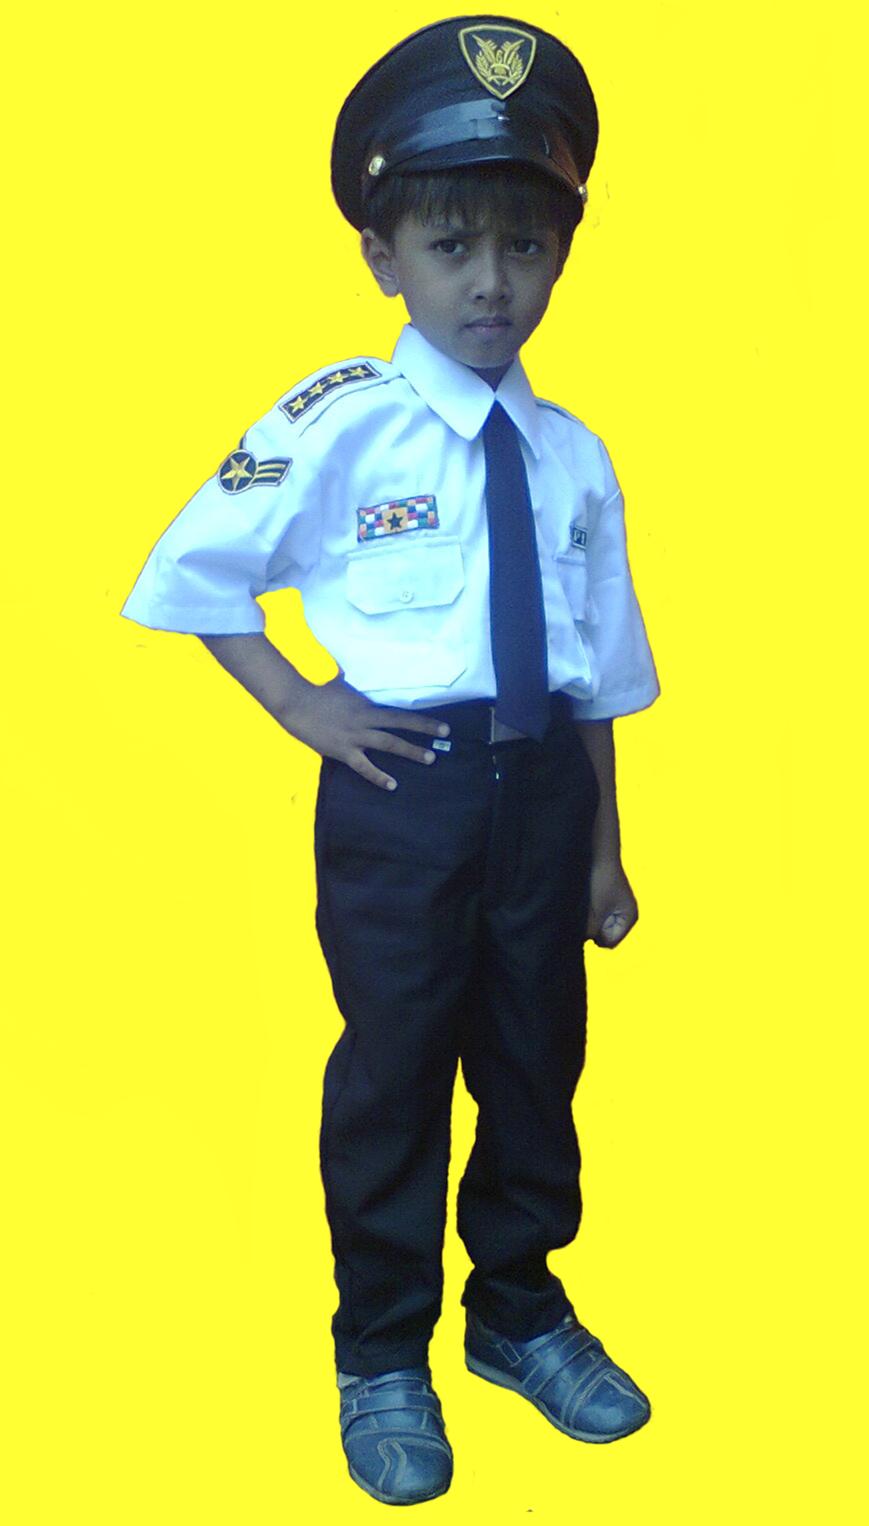 baju profesi anak baju pilot anak kostum pilot anak